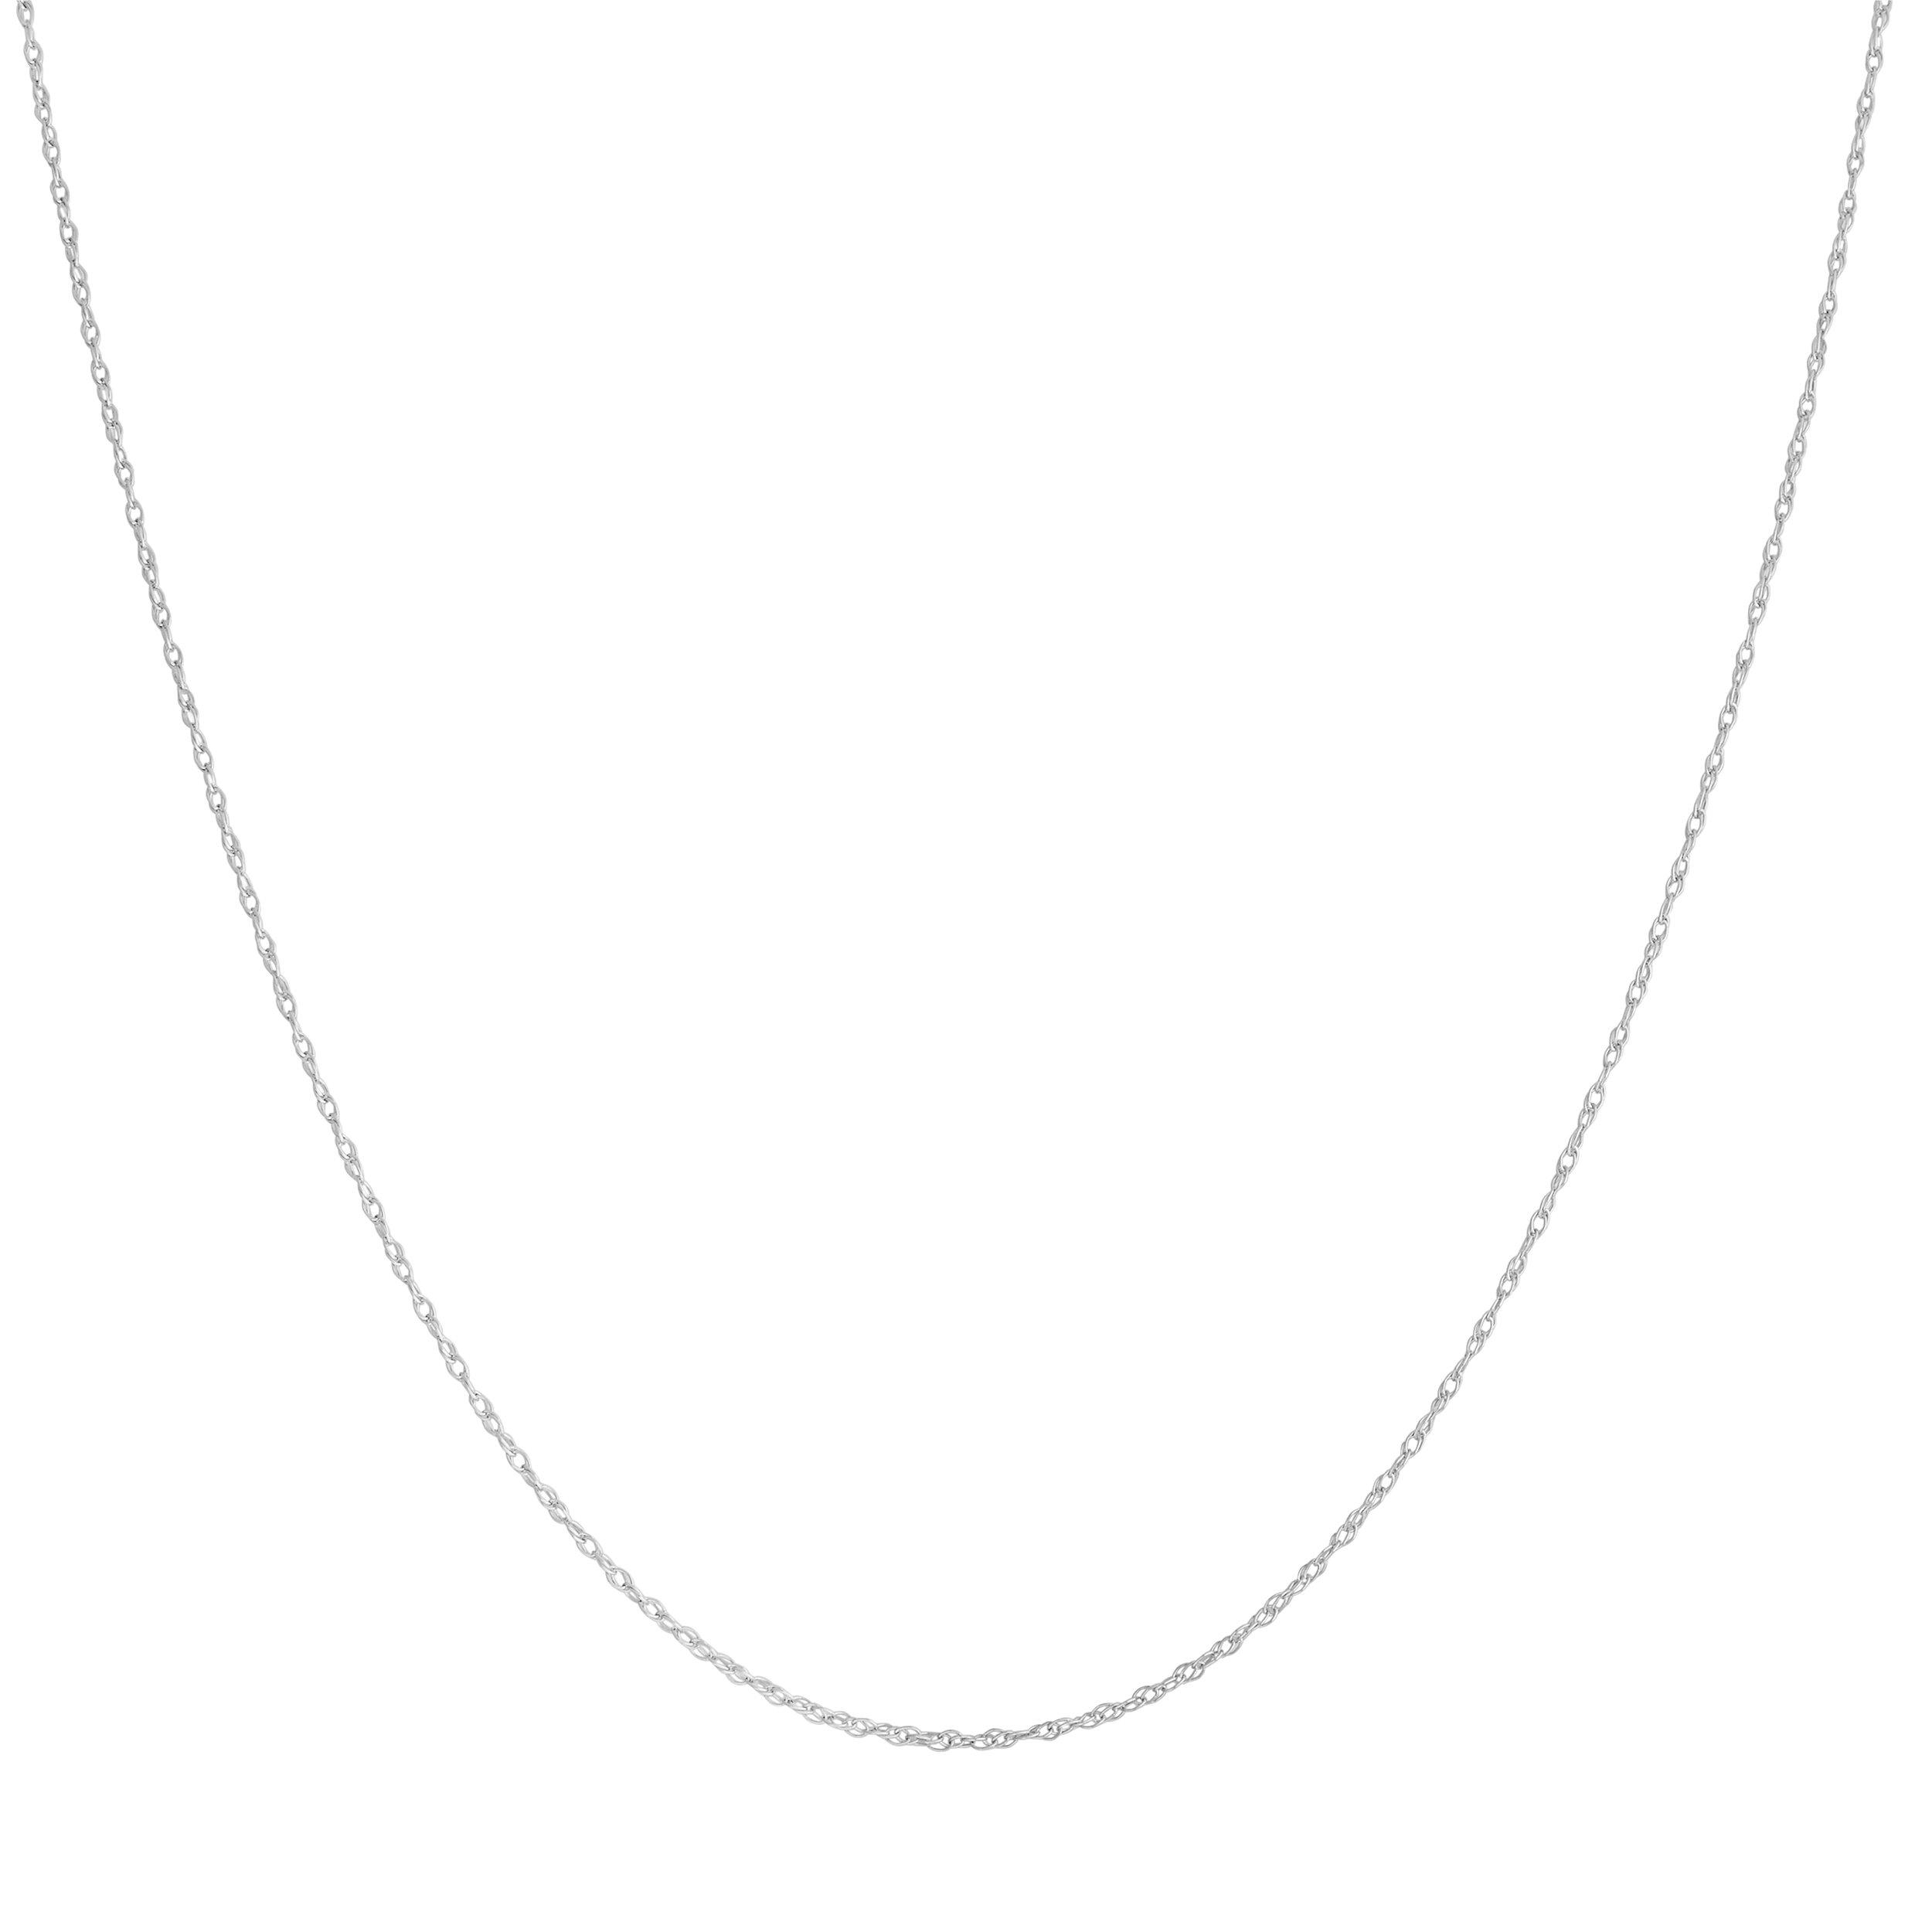 Platinum 950 0.9mm Light Rope Chain (18 inch)